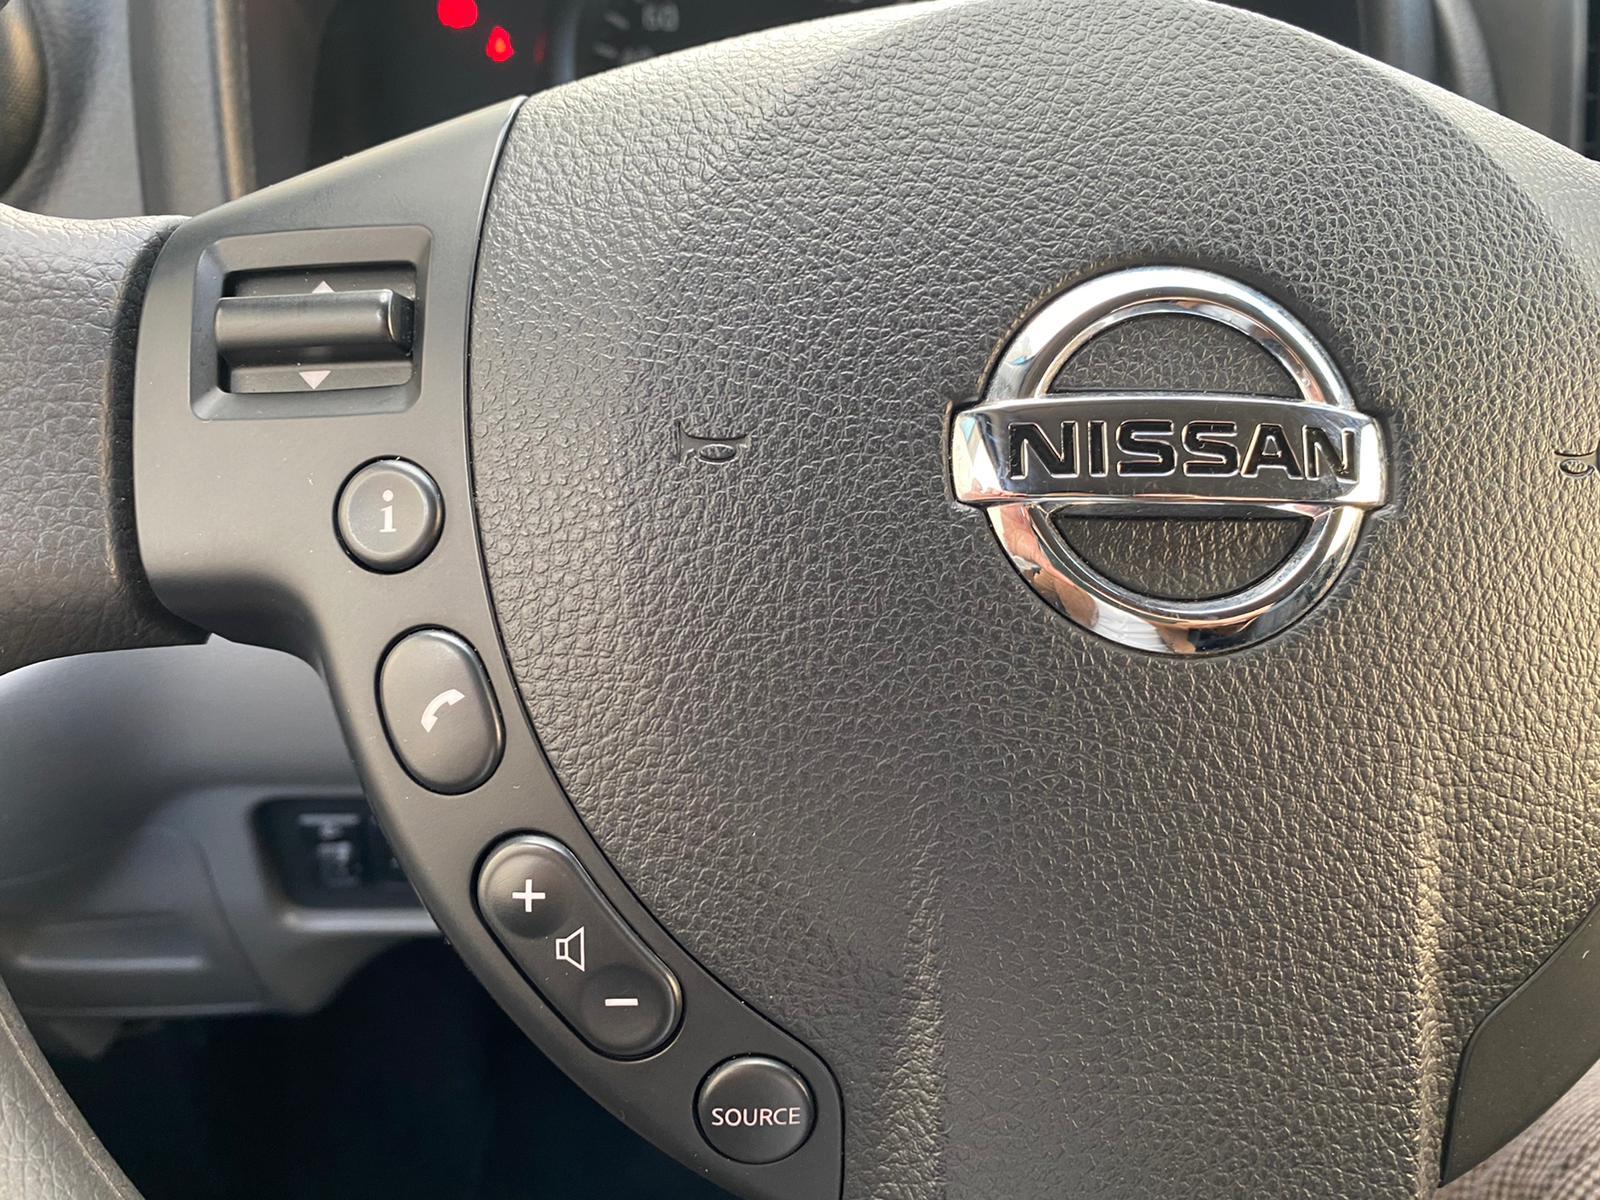 NISSAN NV200 1.5DCI COMFORT AC 2019 FEB20 (14)